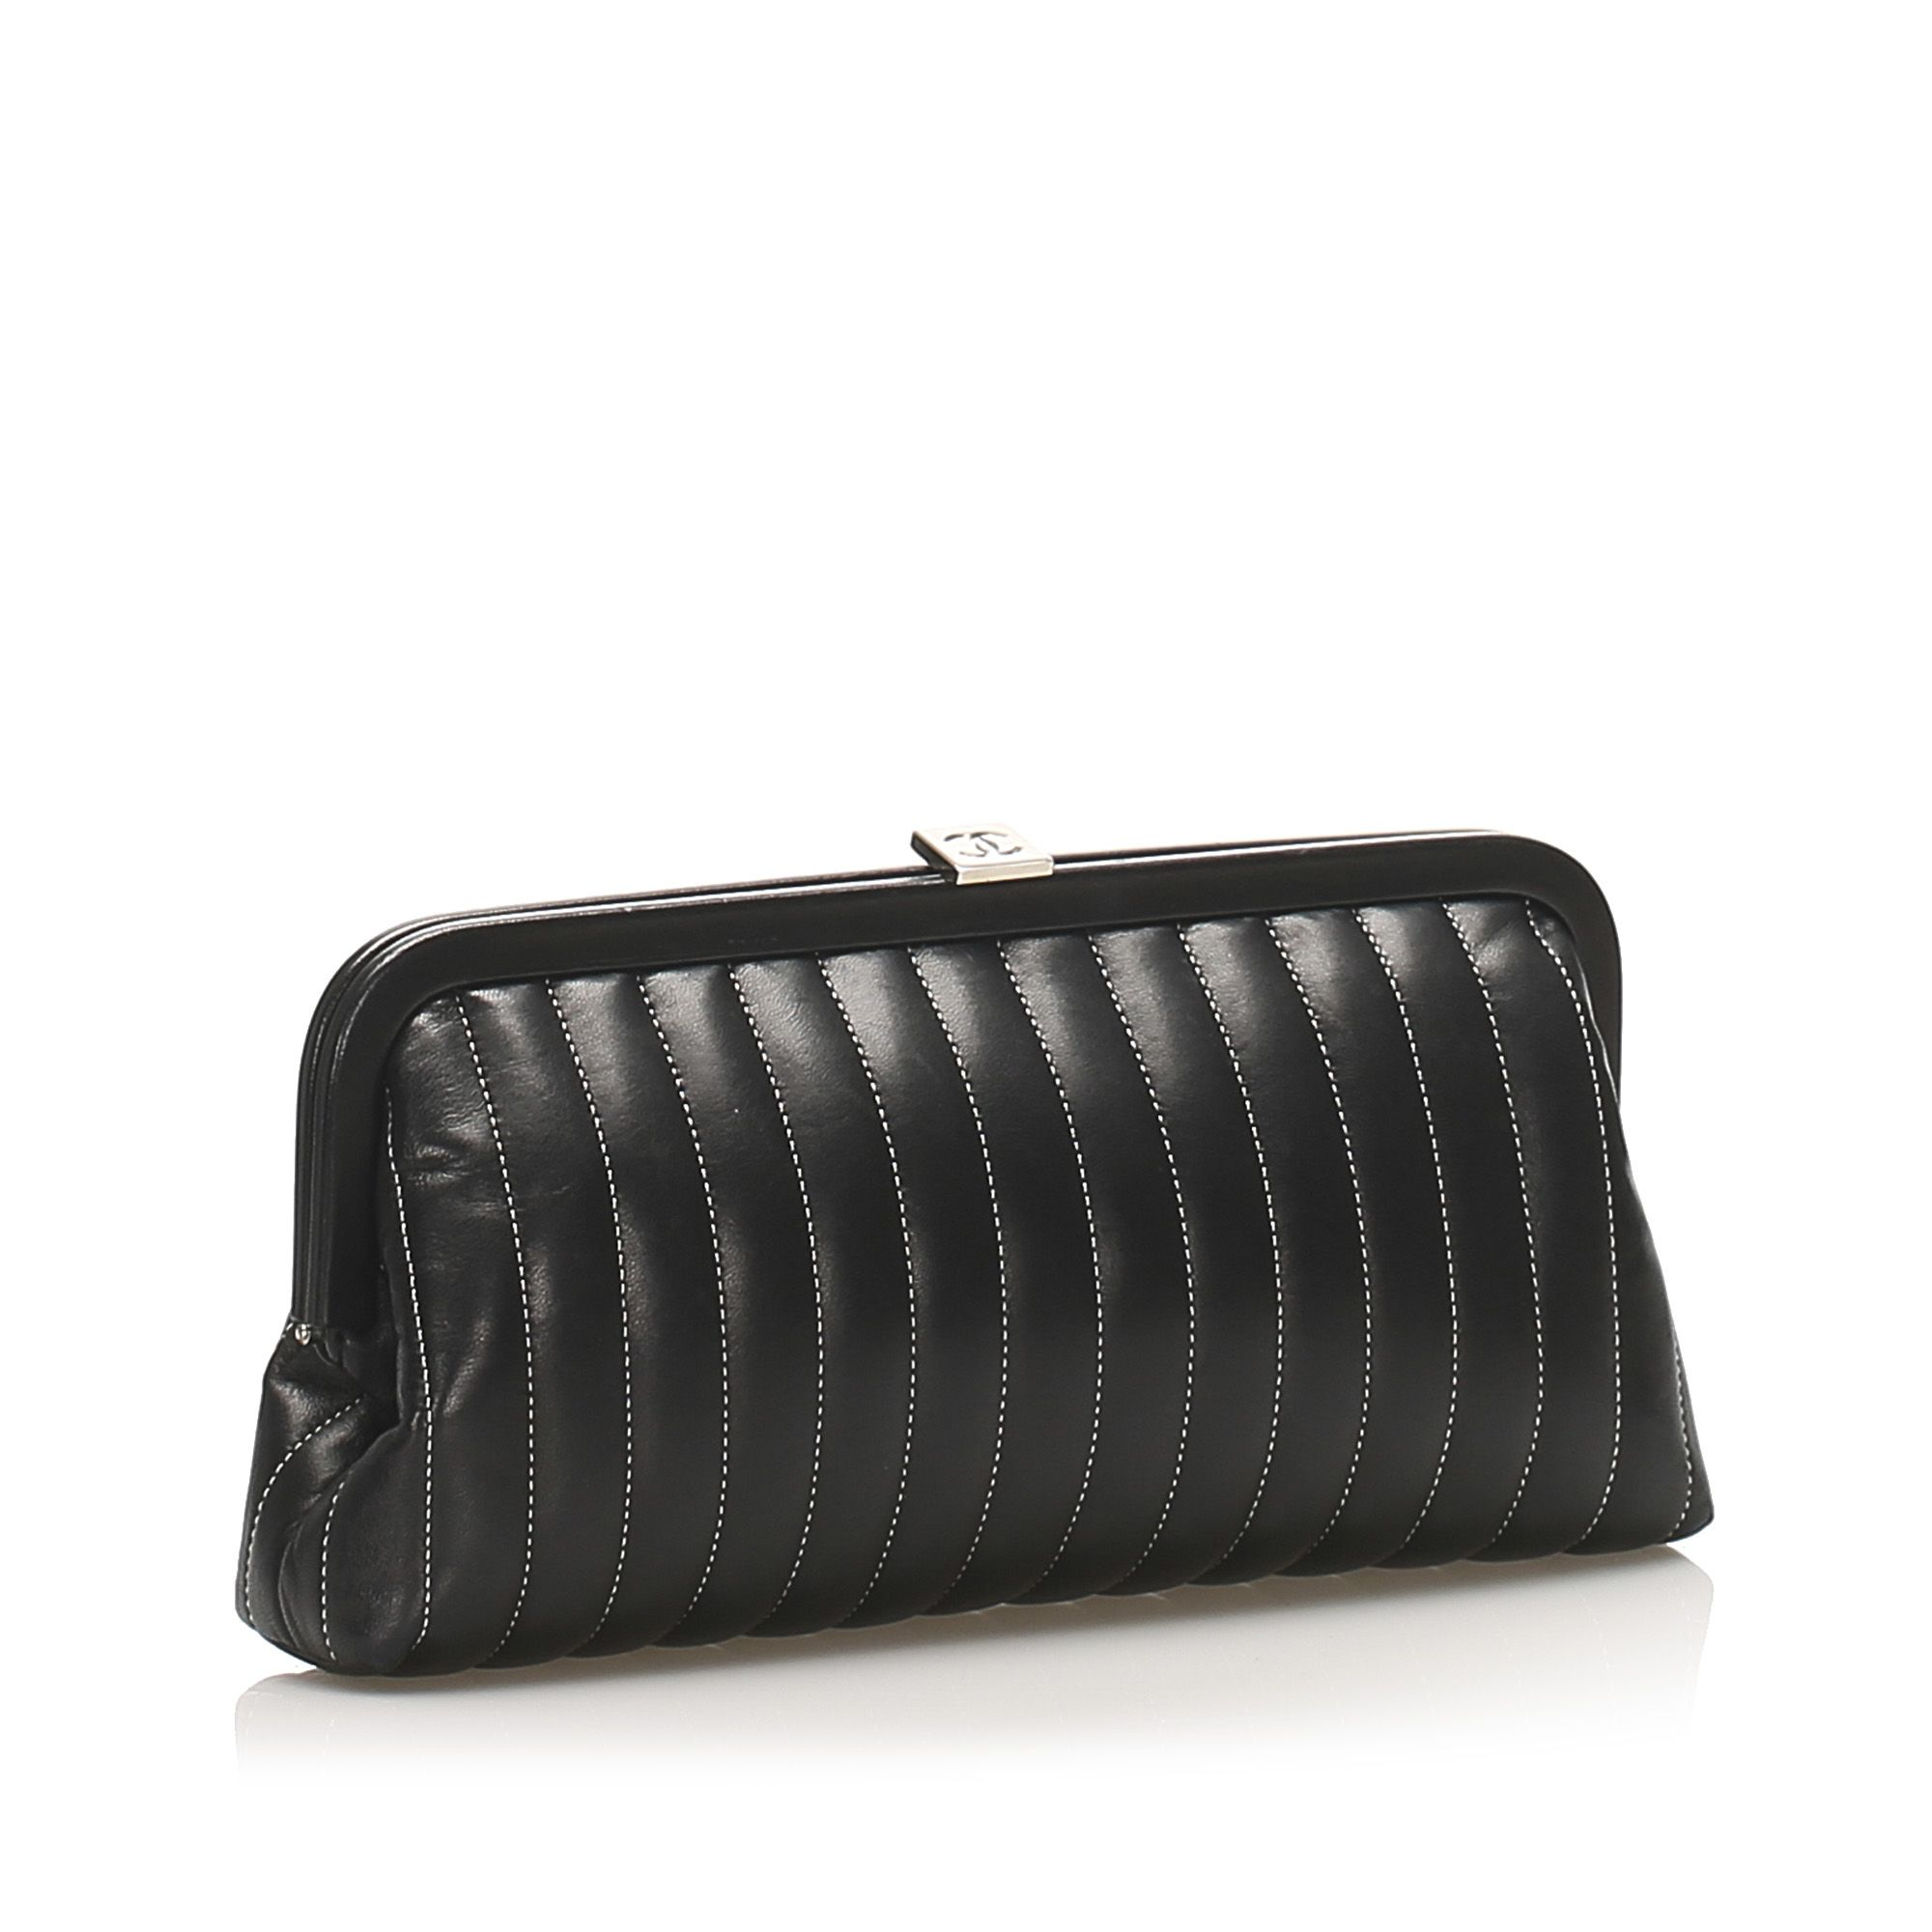 Vintage Chanel Mademoiselle Stitch Lambskin Leather Clutch Bag Black